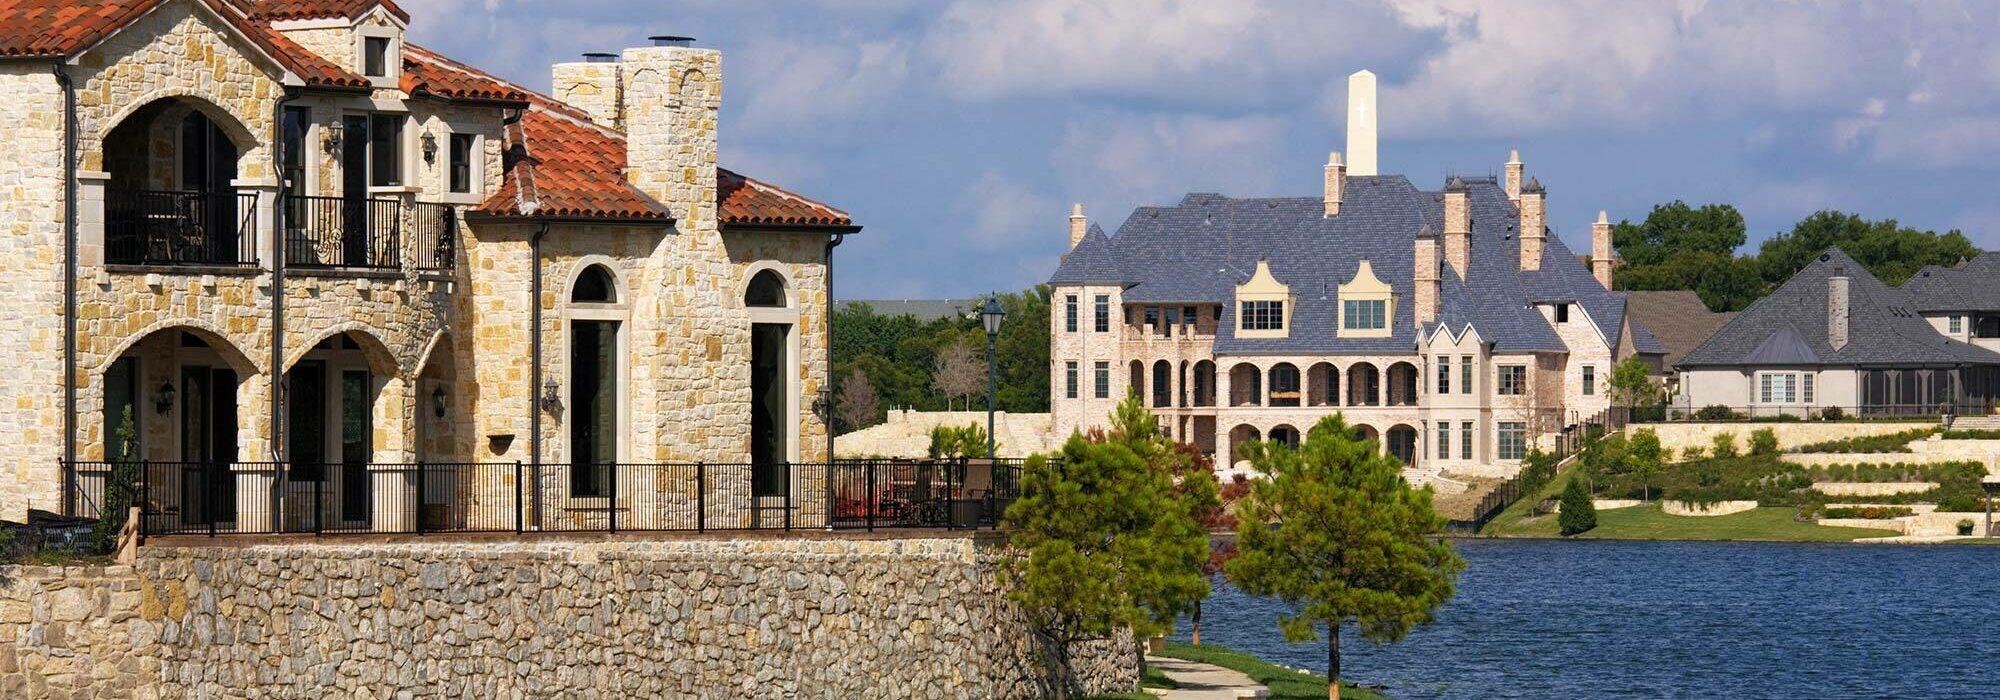 Texas Texas home Onesie\u00ae State